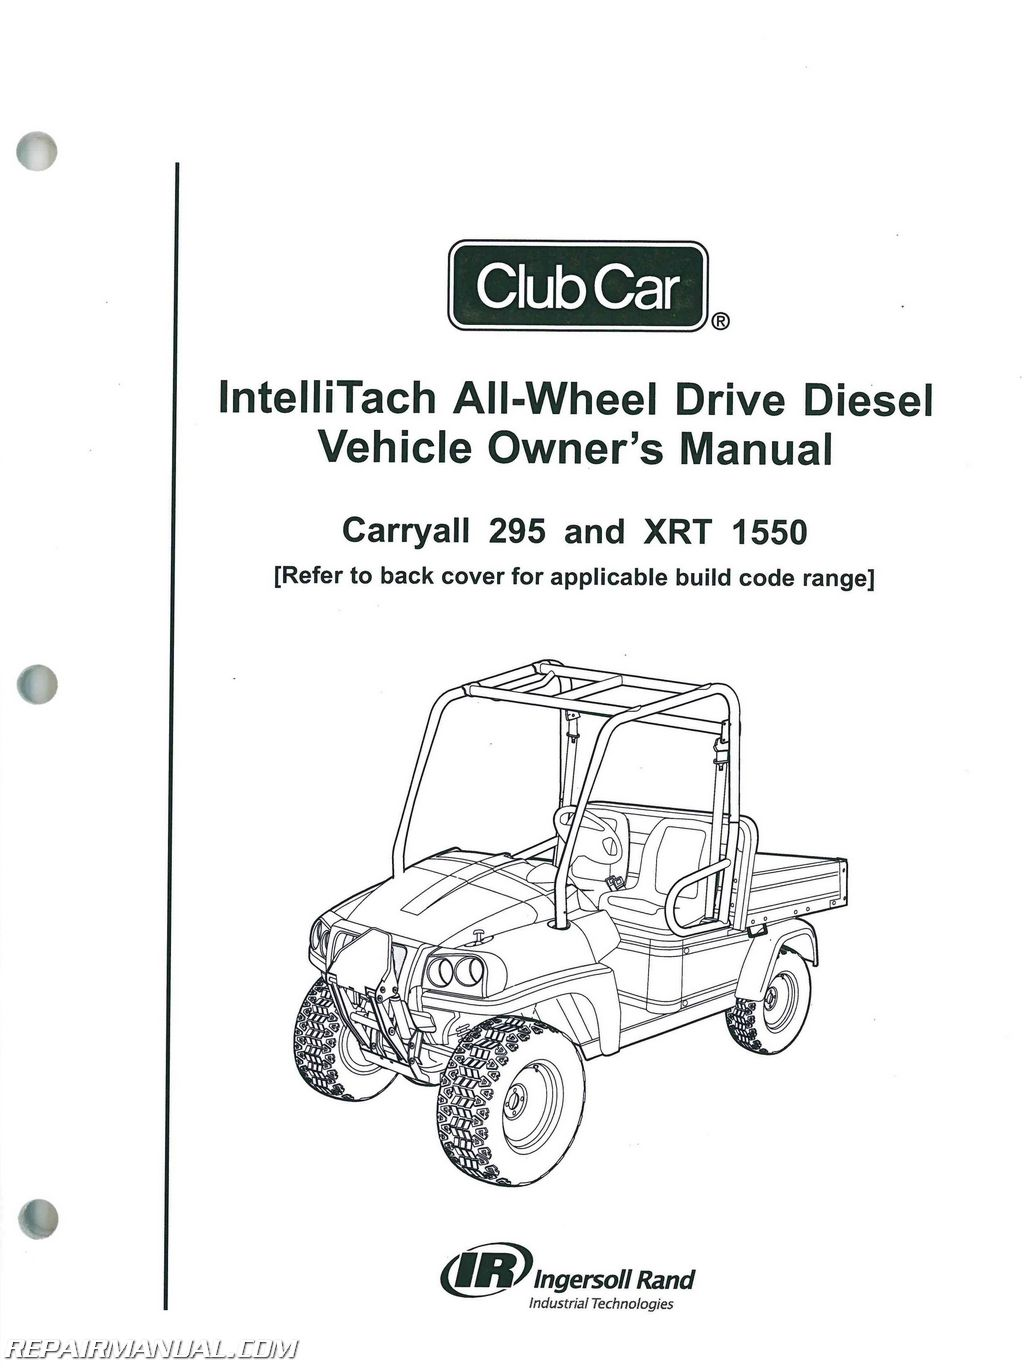 hight resolution of club car carryall 295 intellitach xrt 1550 intellitach